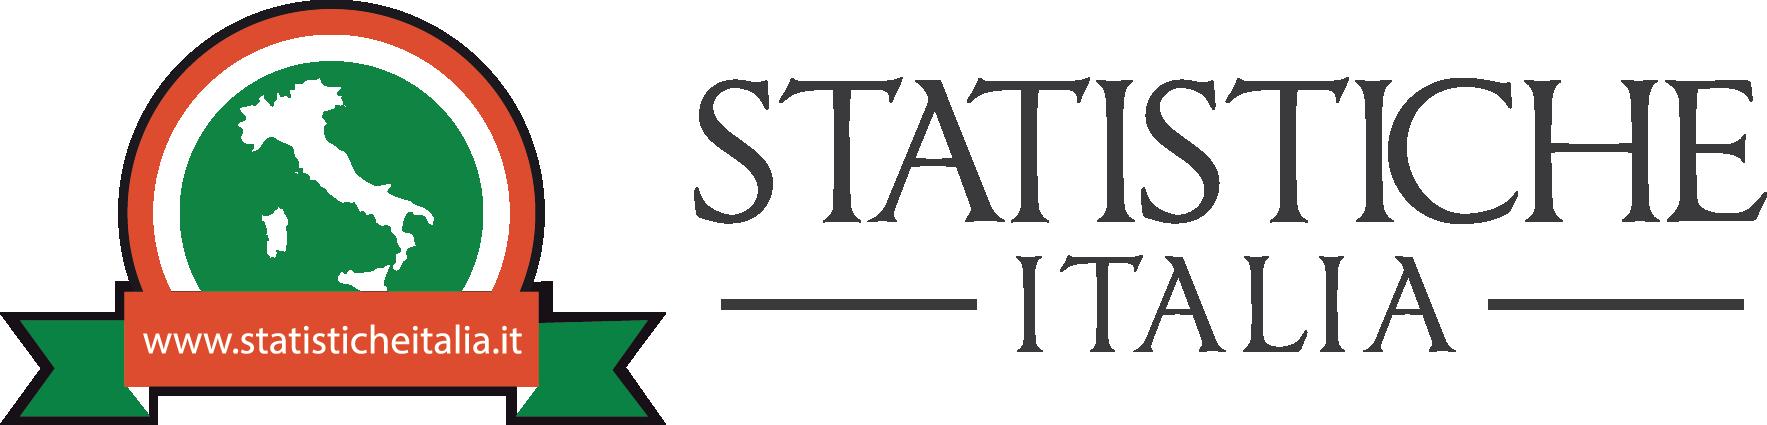 Notizie StatisticheItalia.it